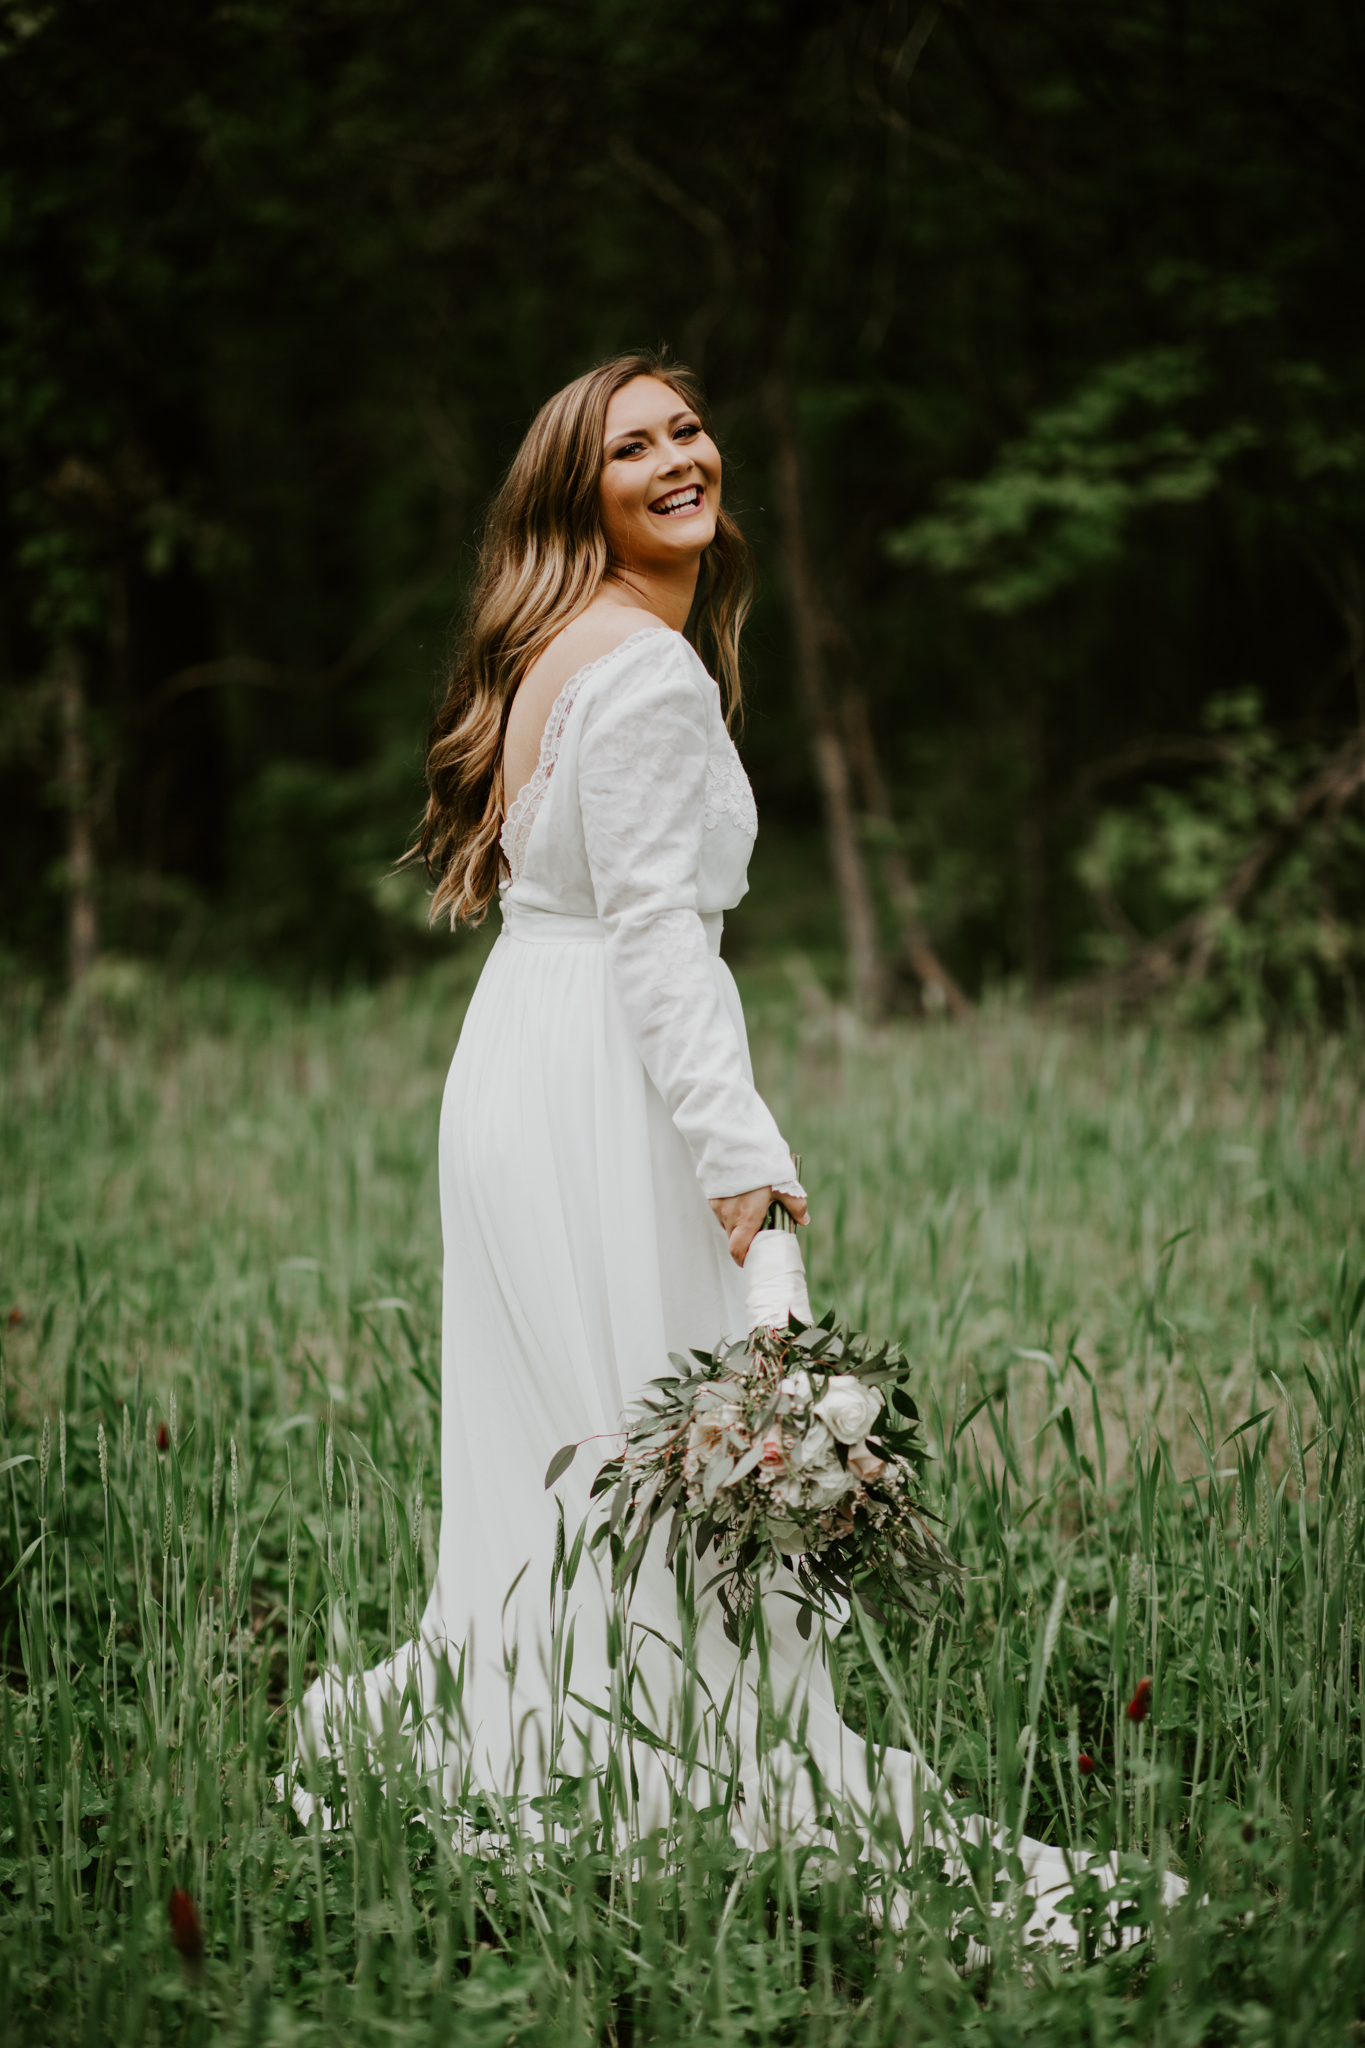 Lacey-Joe-Chattanooga-Nashville-Tennessee-Wedding-Elopement-Photographer-187.jpg